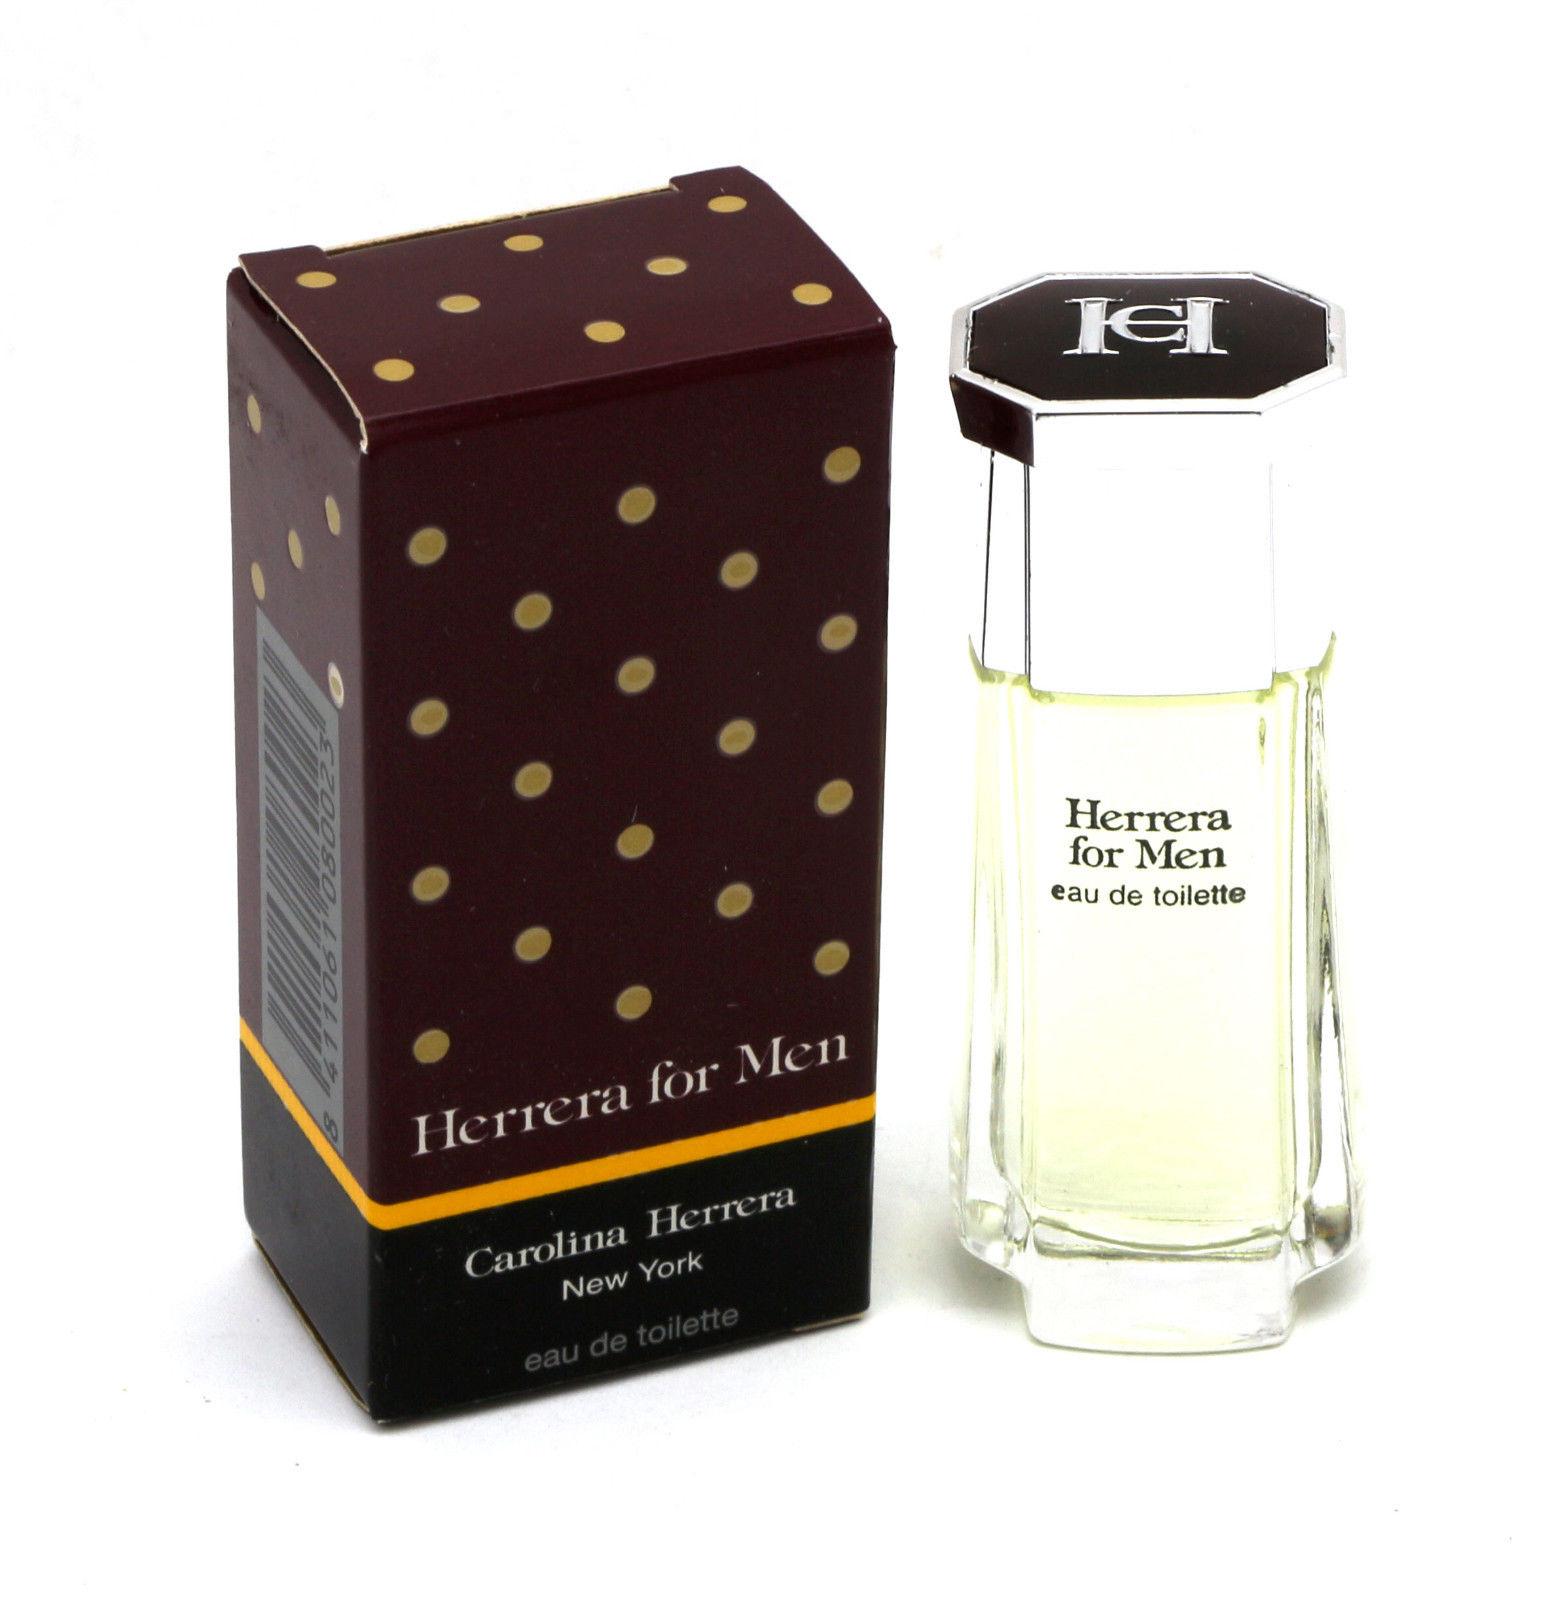 Carolina Herrera Herrera for Men, Toaletní voda, 7ml, Pánska vôňa, + AKCE: dárek zdarma